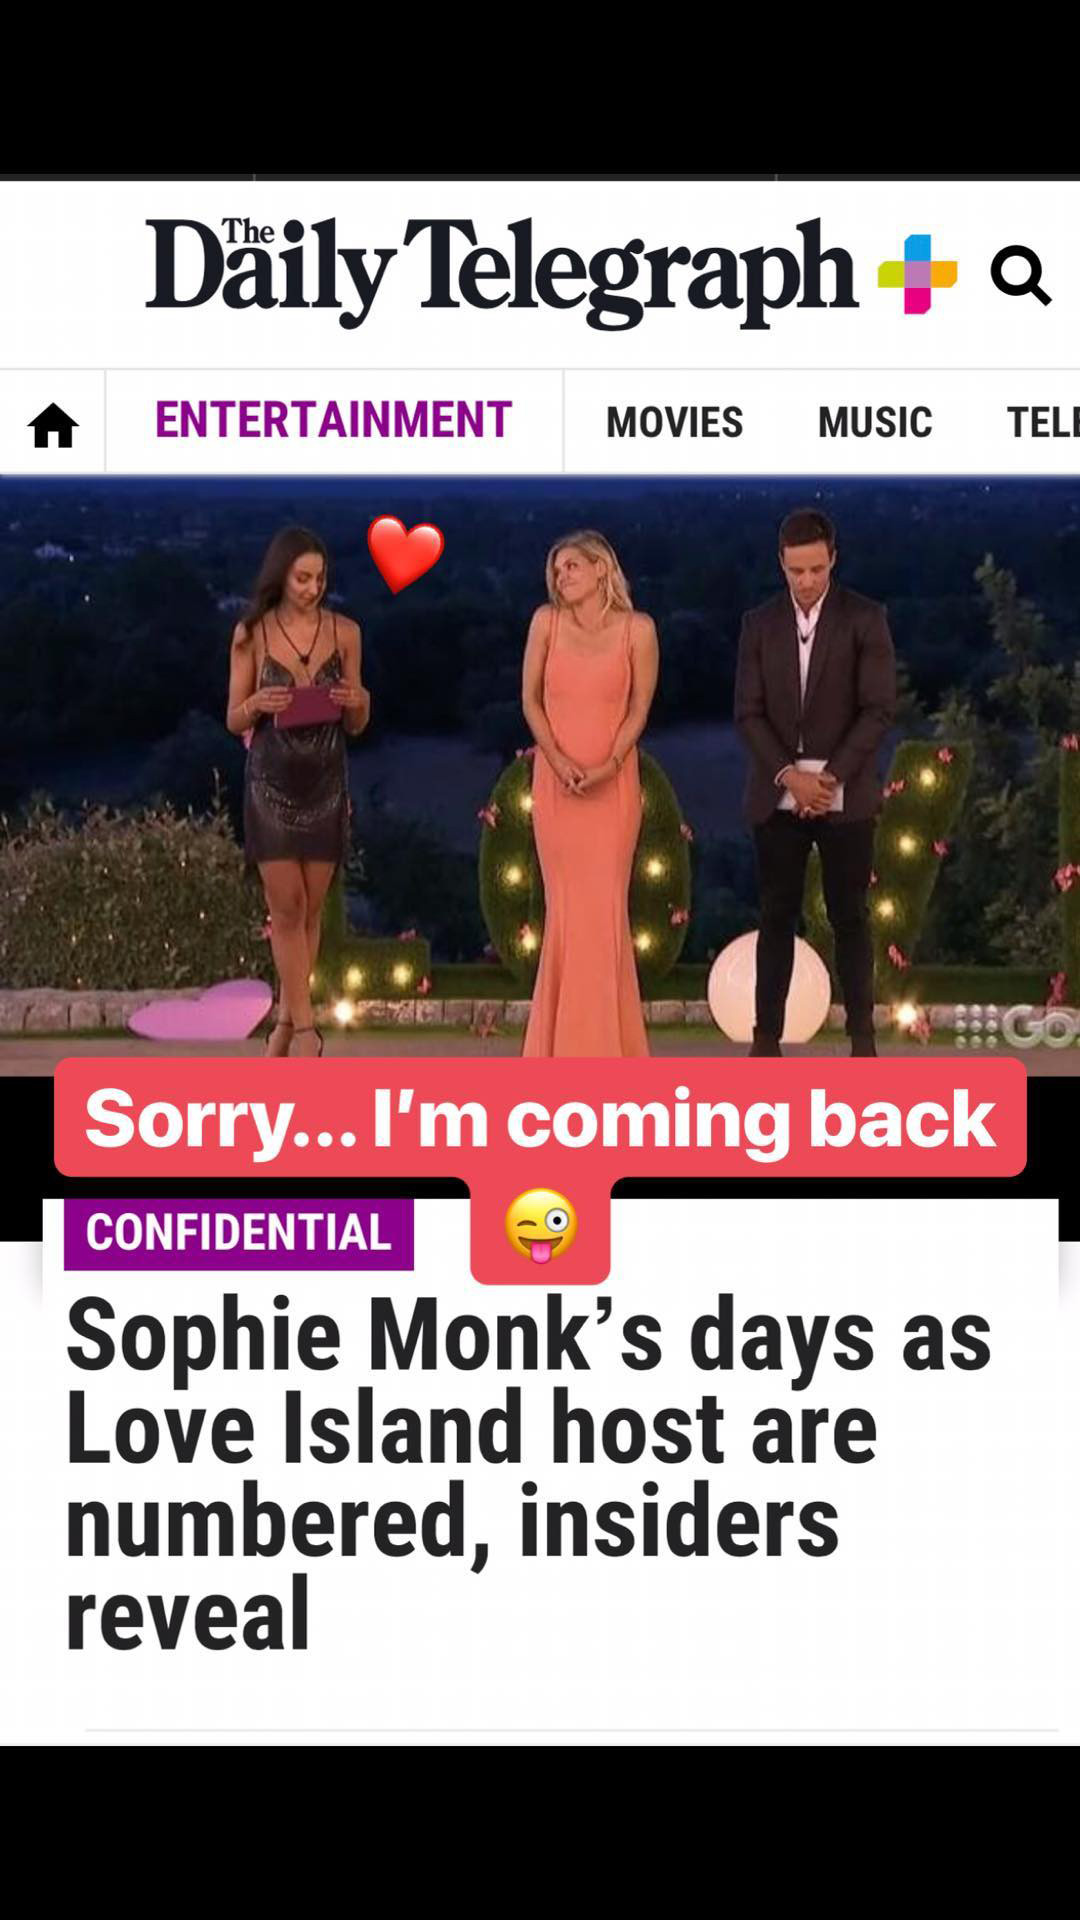 Sophie Monk